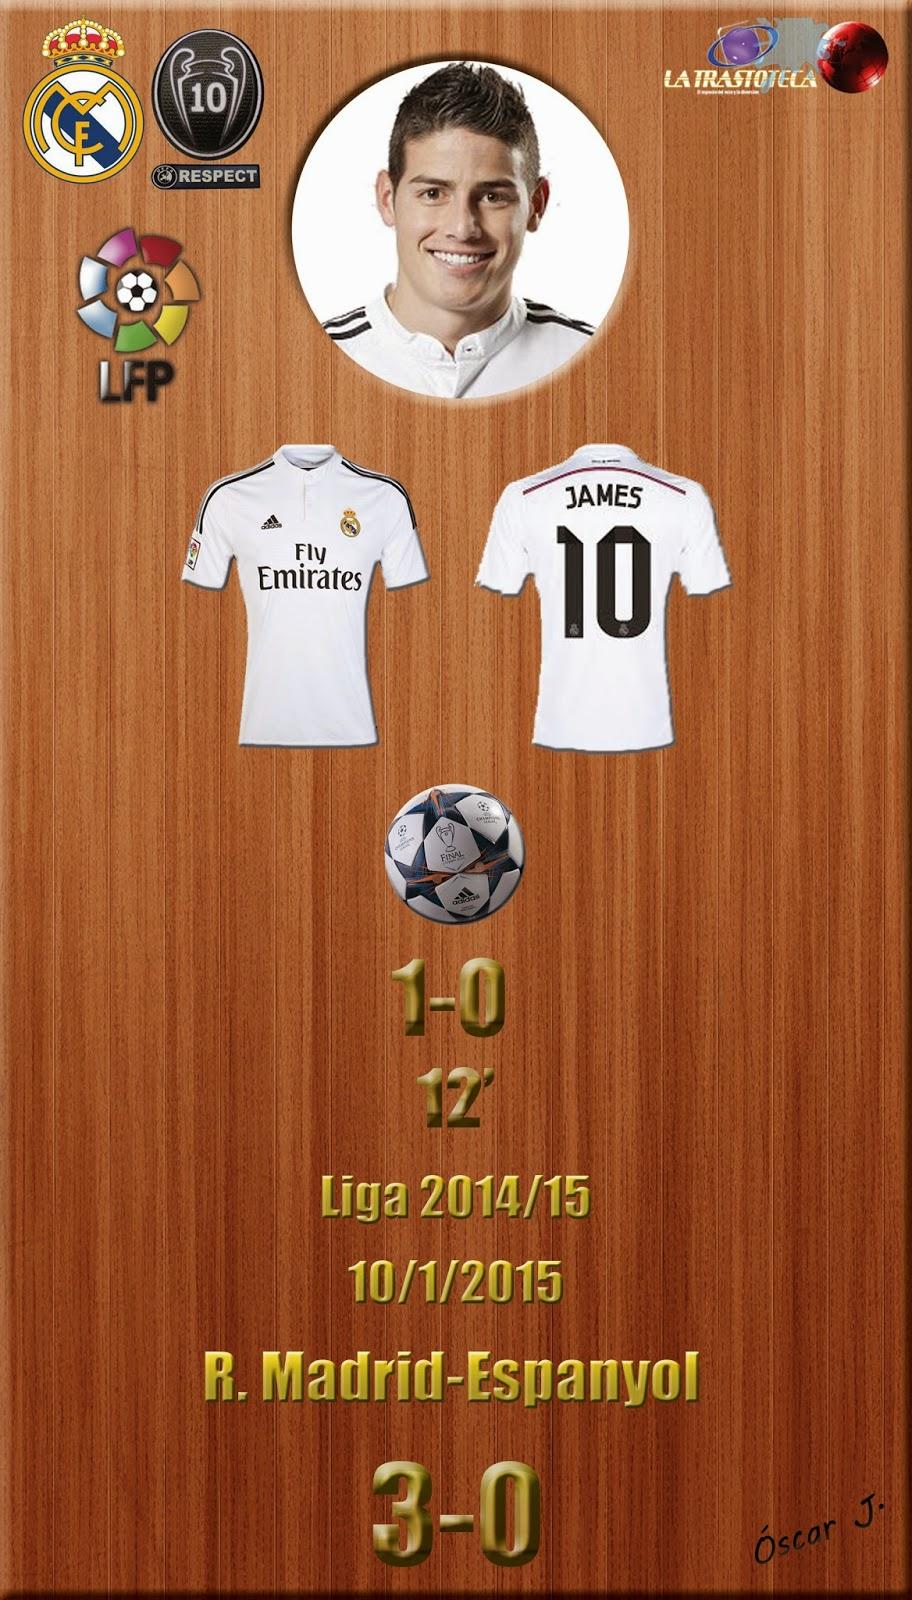 James Rodríguez (1-0) - Real Madrid 3-0 Espanyol - Liga 2014/15 - Jornada 18 - (10/1/2015)